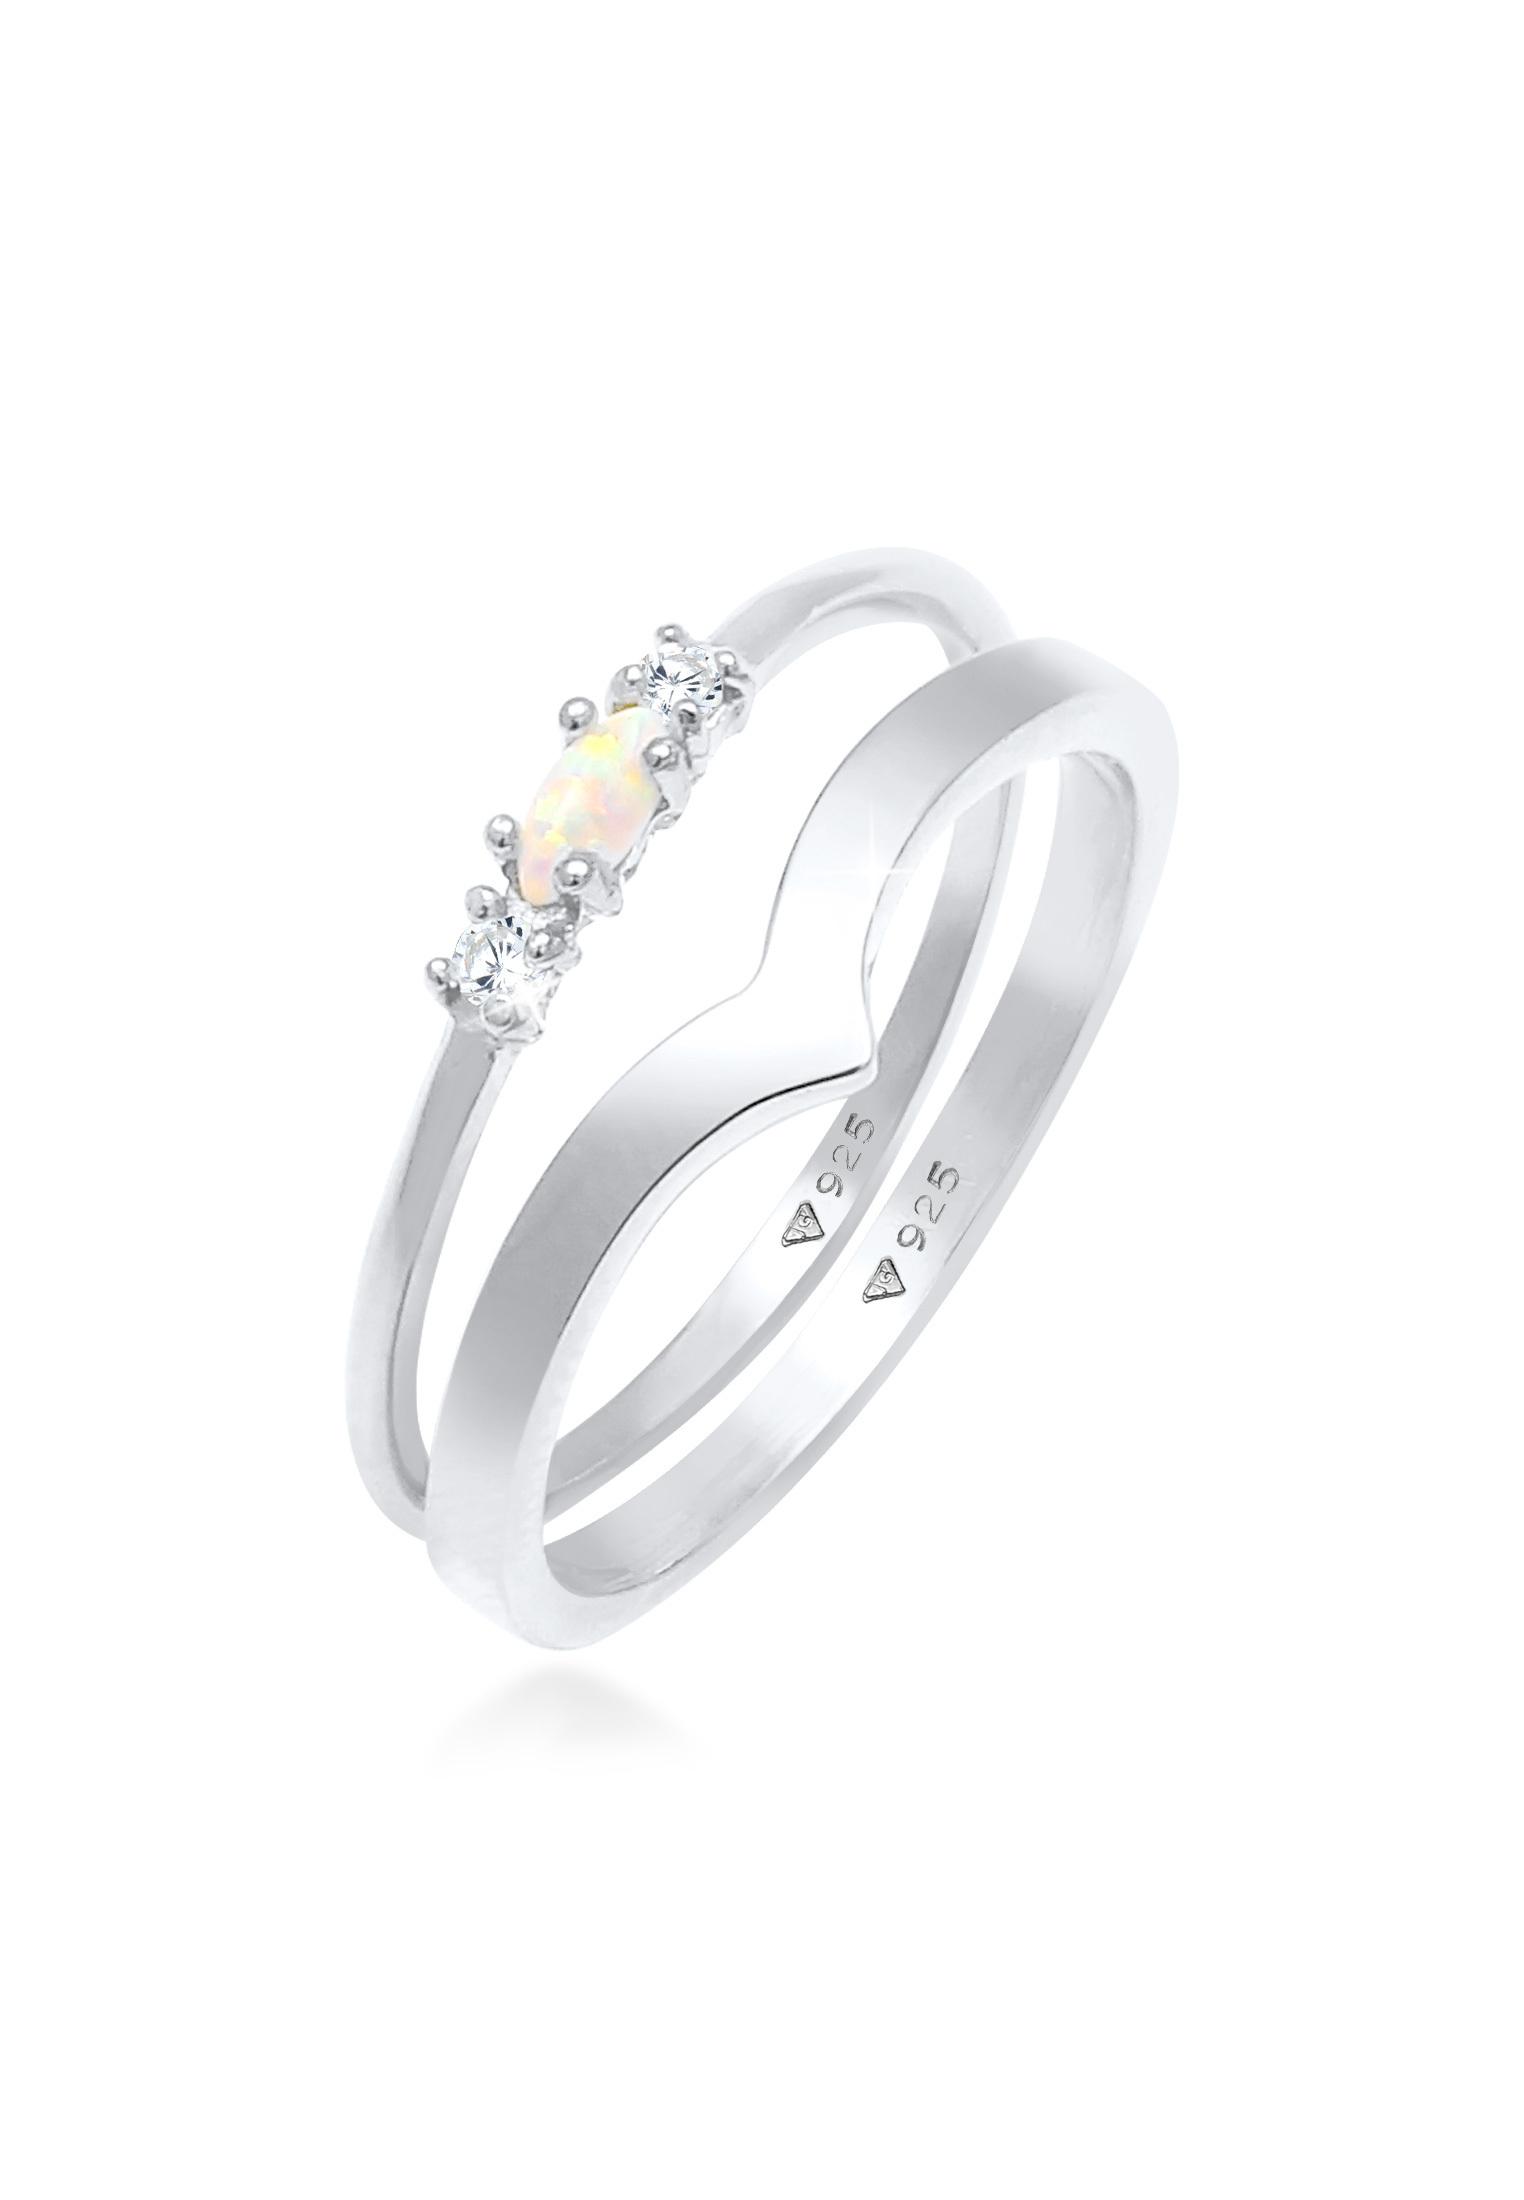 Ringset   Opal ( Weiß )   925er Sterling Silber